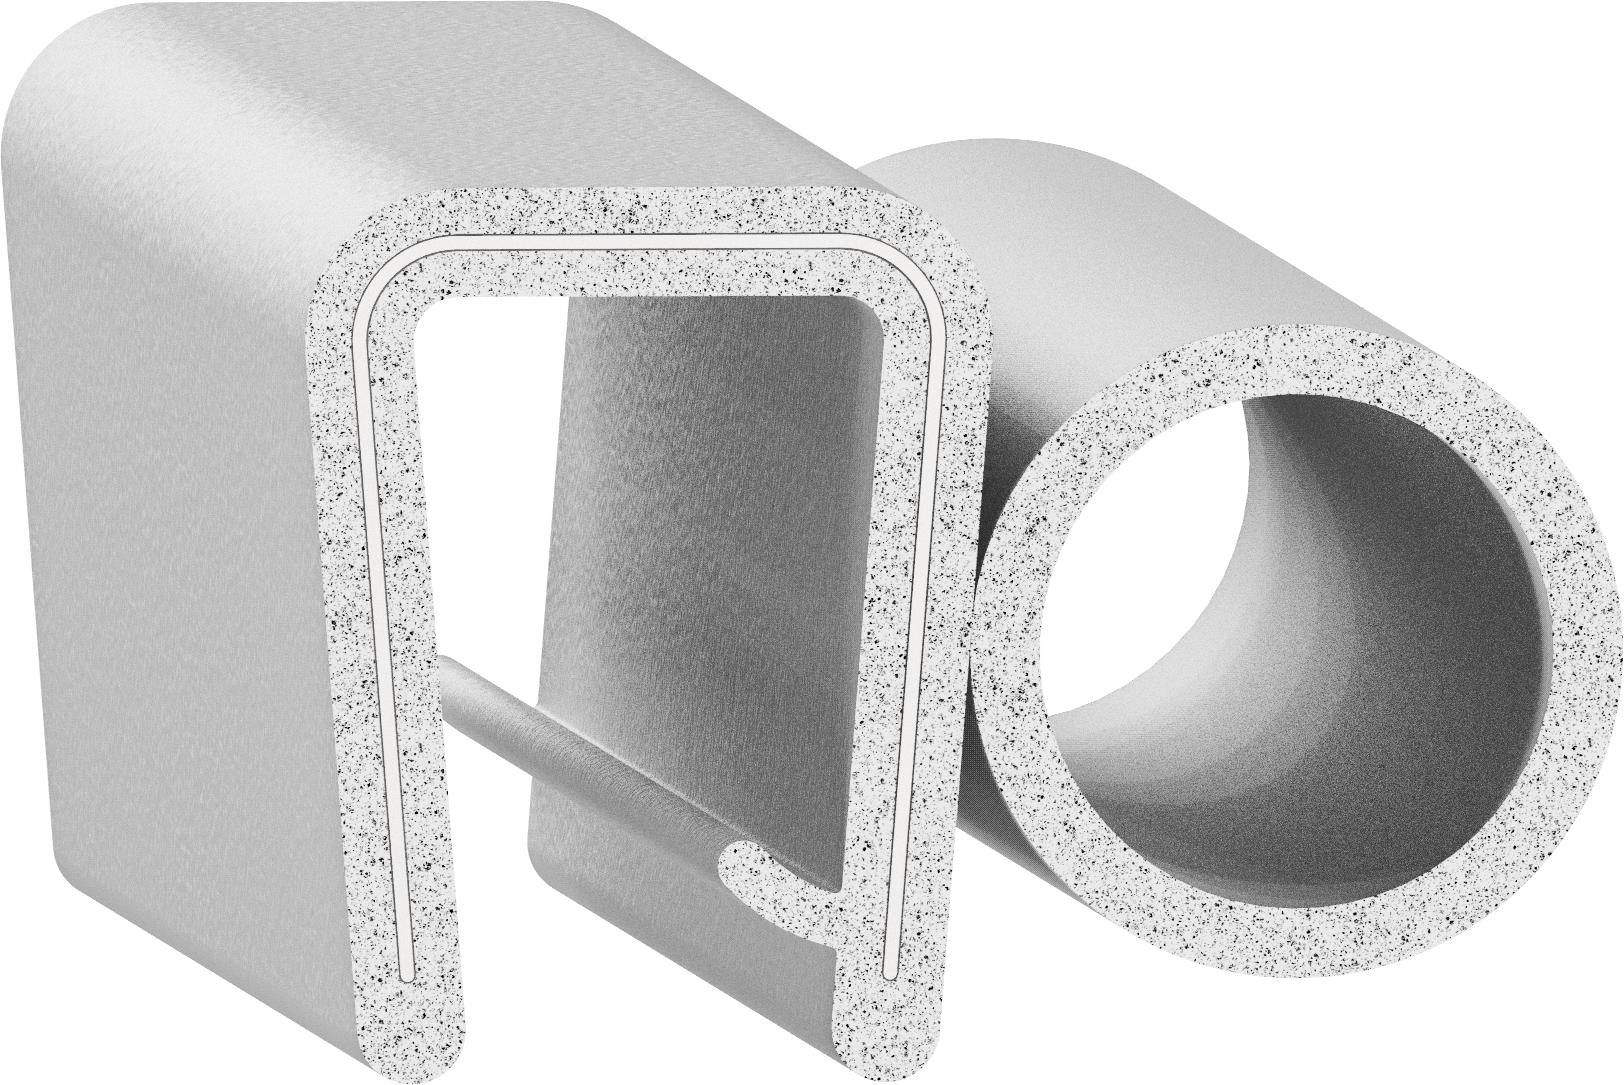 Uni-Grip part: SD-1875 w/ 3/4in Bulb White